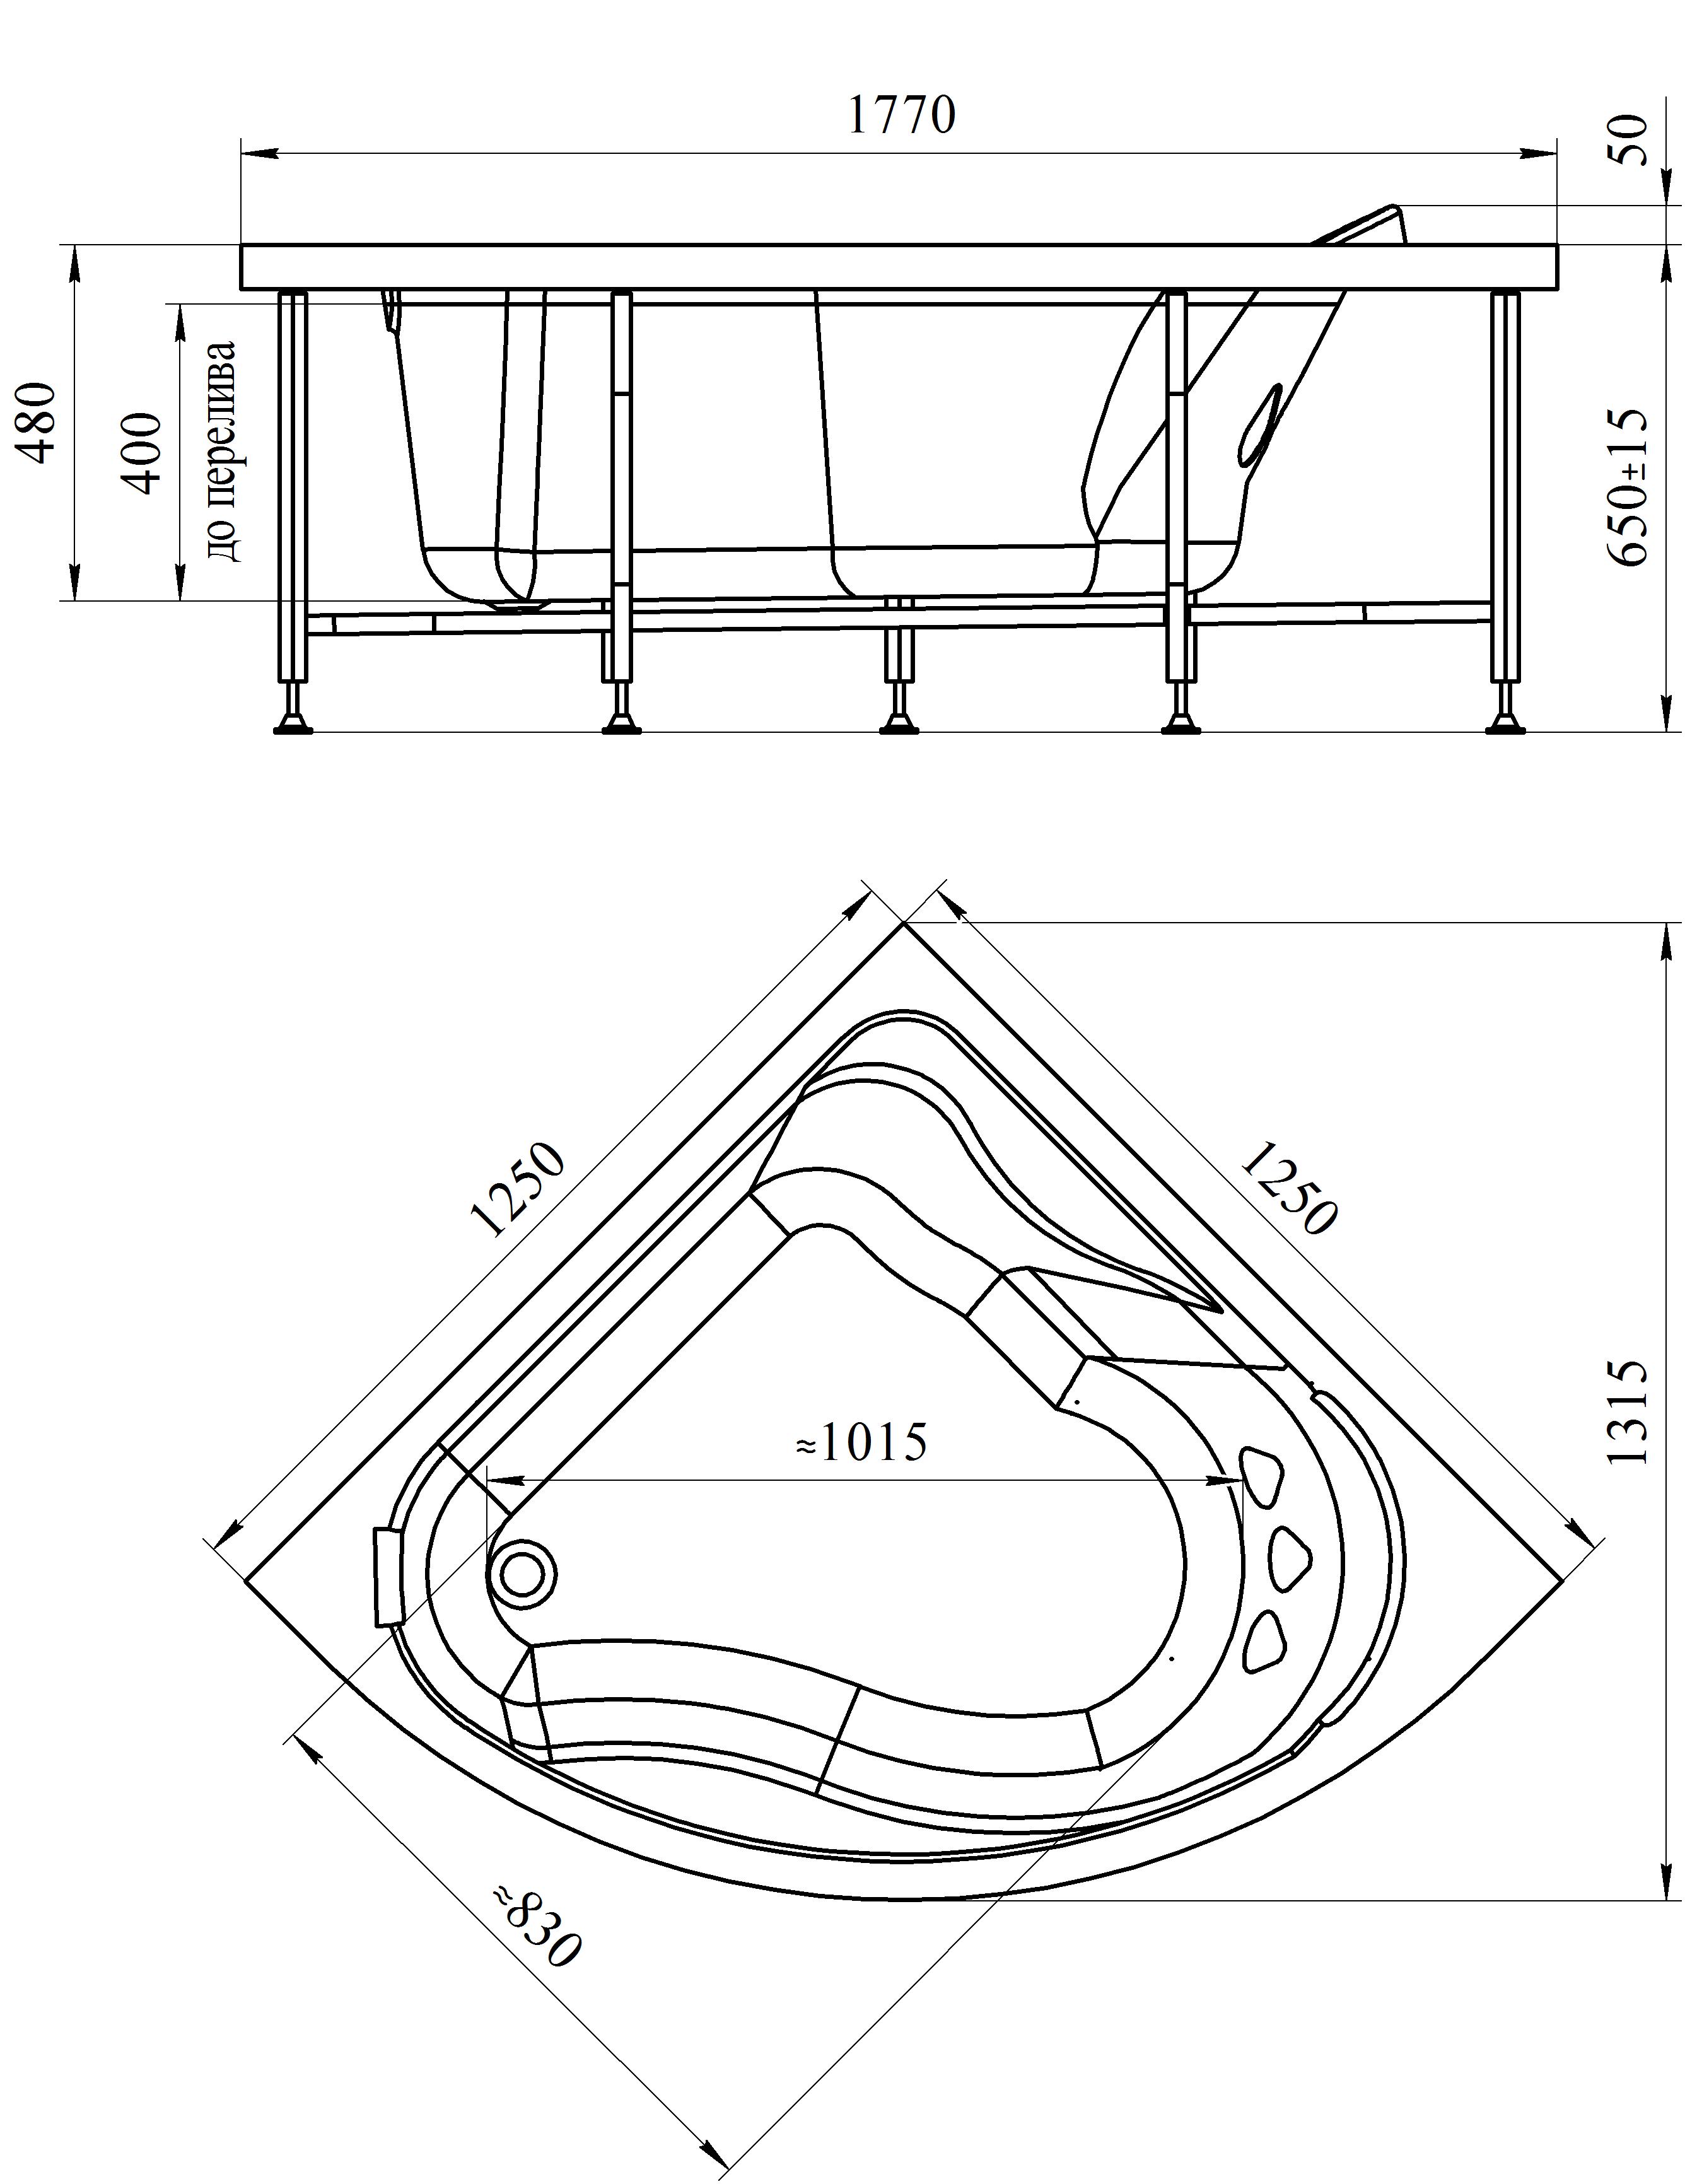 Фото 2942: Акриловая ванна Радомир (Vannesa) Альтея 125 х 125